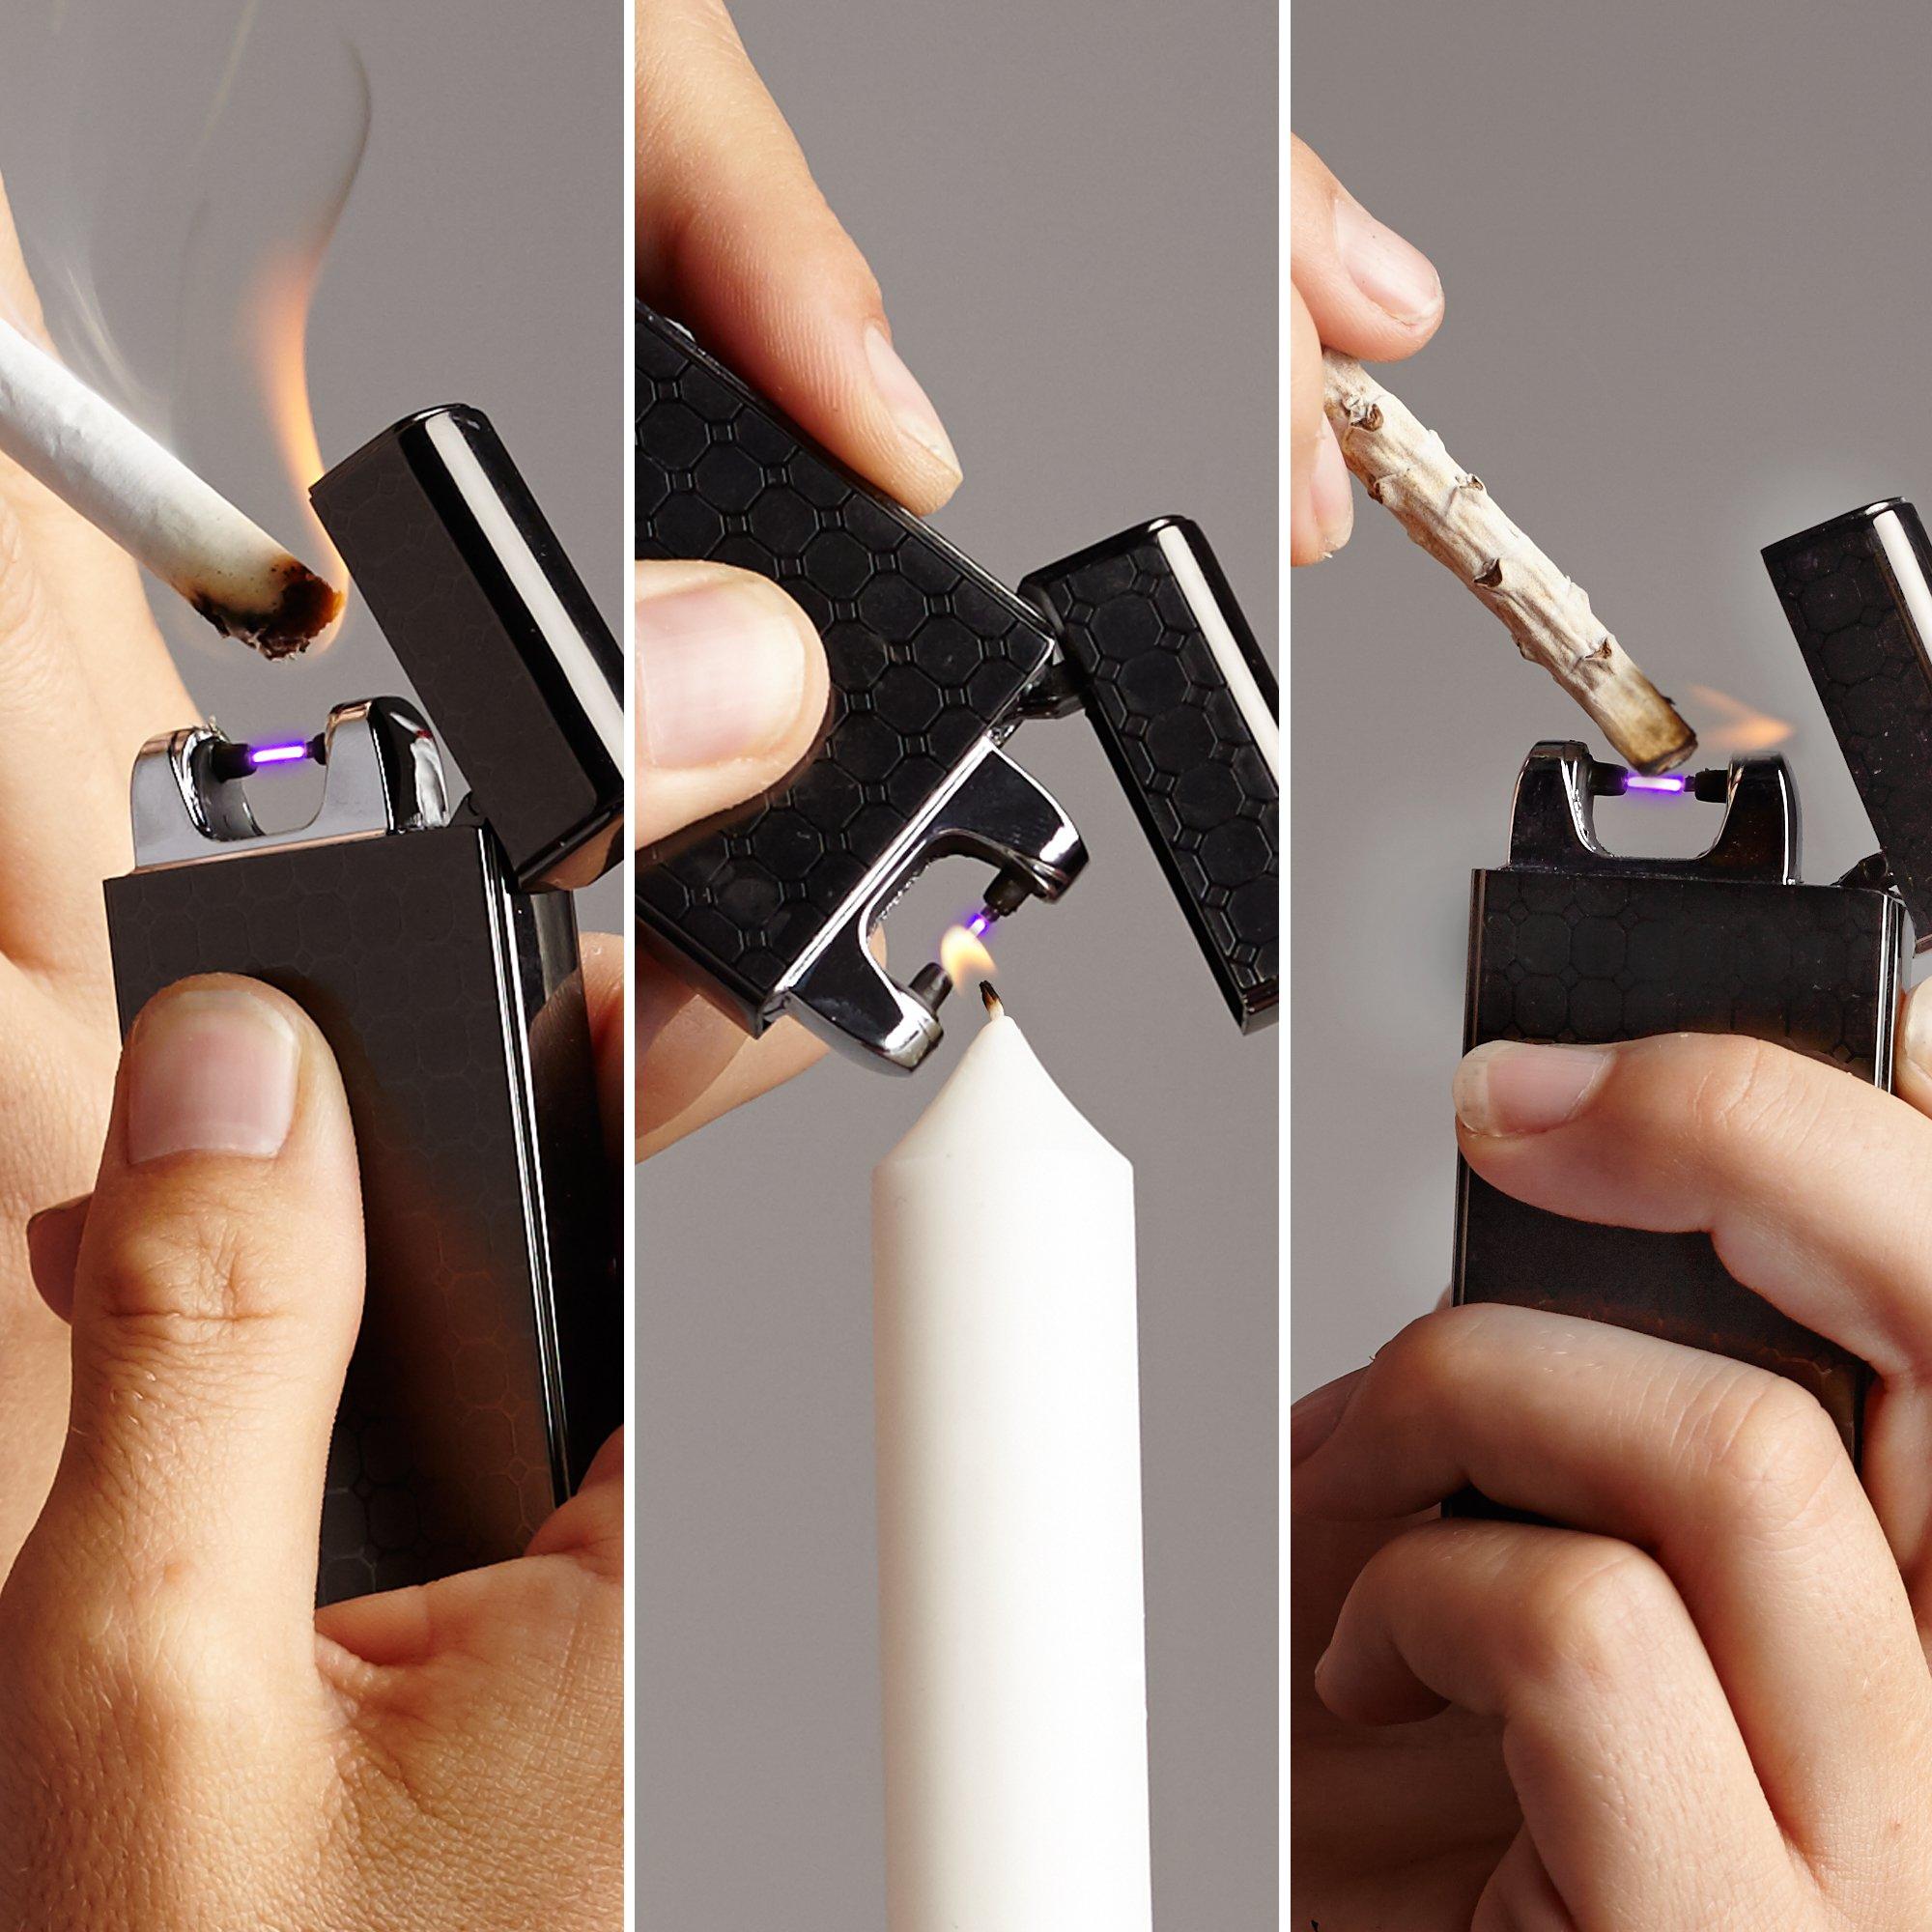 SaberLight - Revolutionary Flameless Plasma Beam Lighter - Rechargeable - Airport Safe - Butane Free - Flameless - Splash Proof - Windproof - No Harmful Chemicals - Lifetime Warranty (1 Pack)